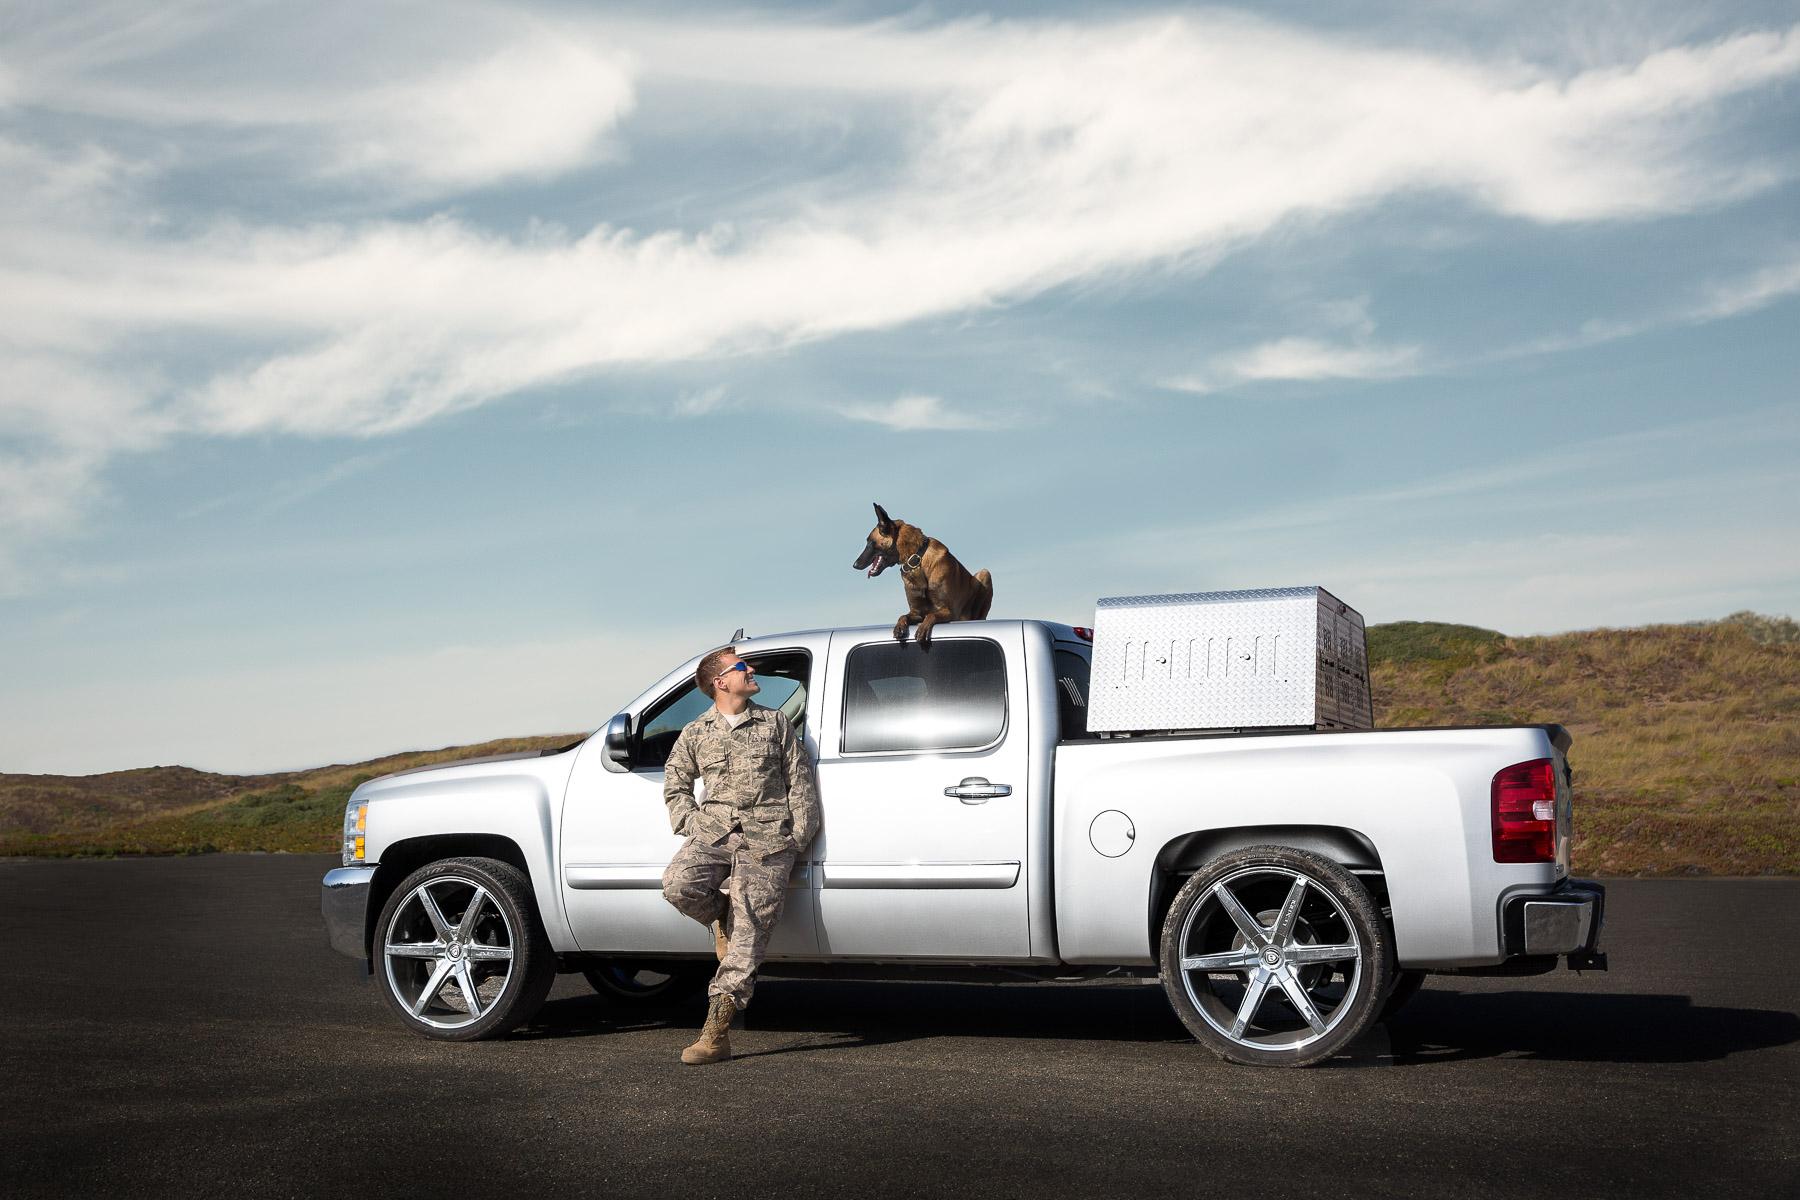 miliraty-man-with-dog-belgian-mallinois-dog-on-top-car-friendship-dog-photography.jpg